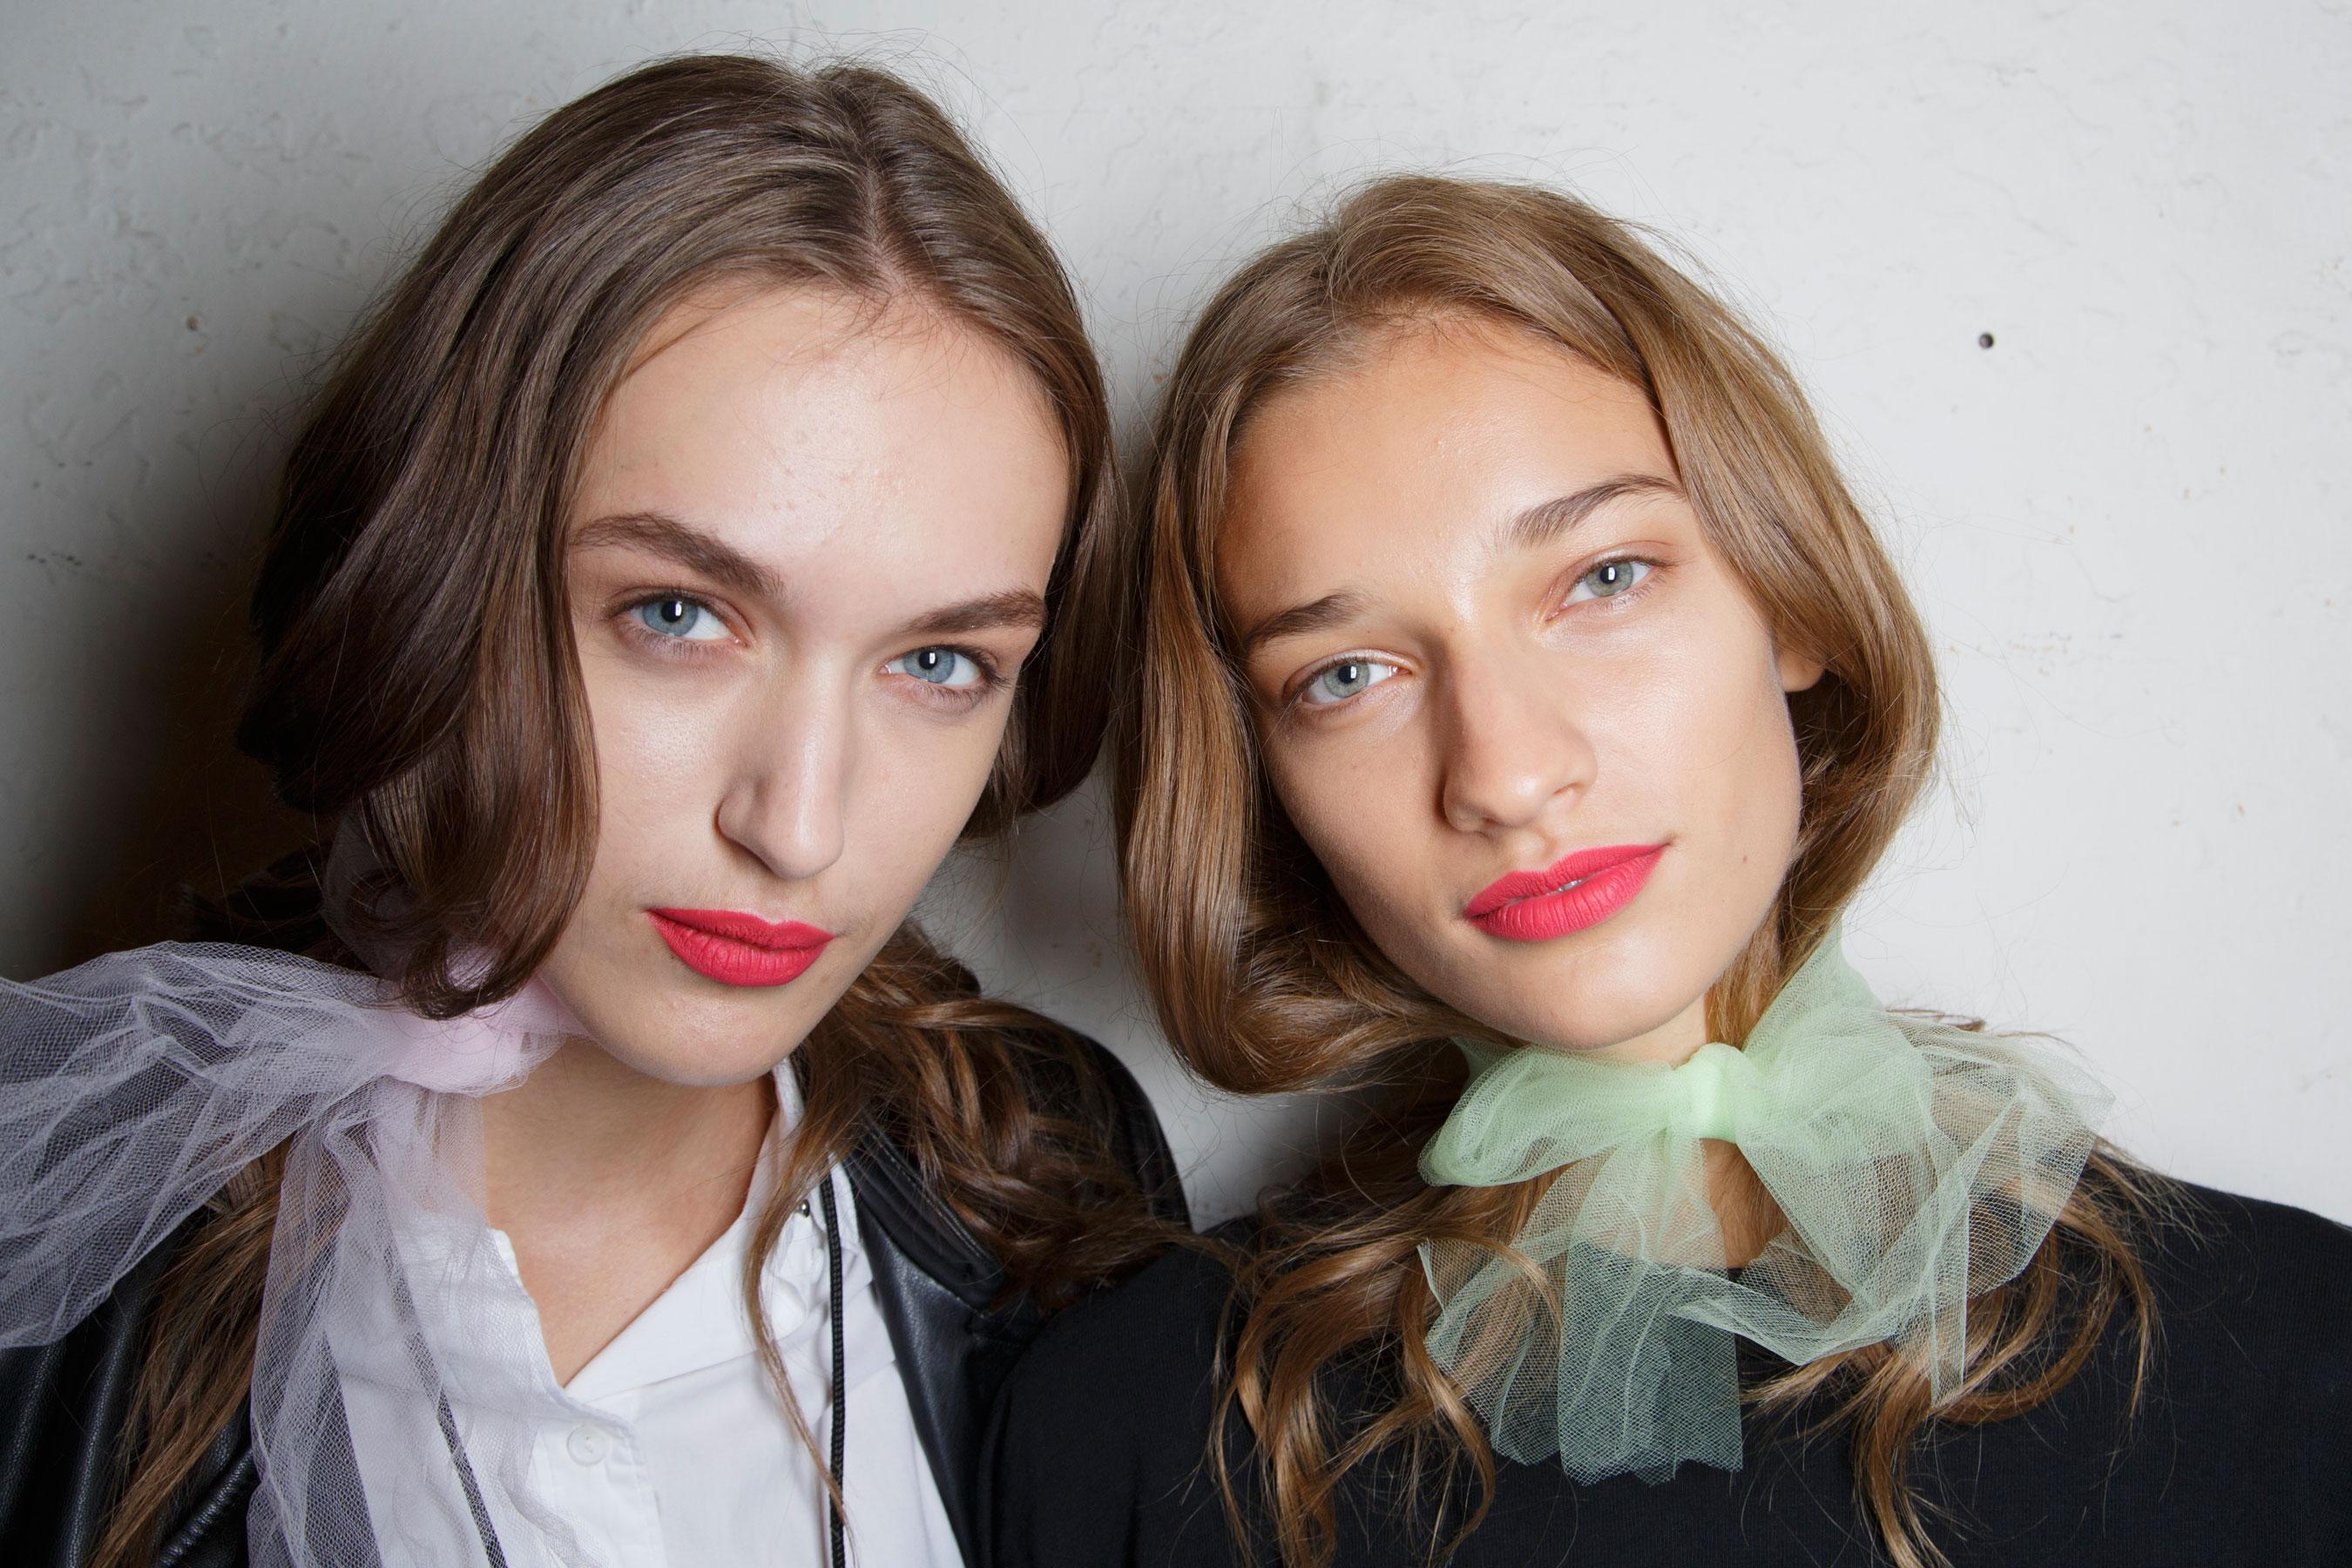 BADGLEY-MISCHKA-backstage-beauty-spring-2016-fashion-show-the-impression-43